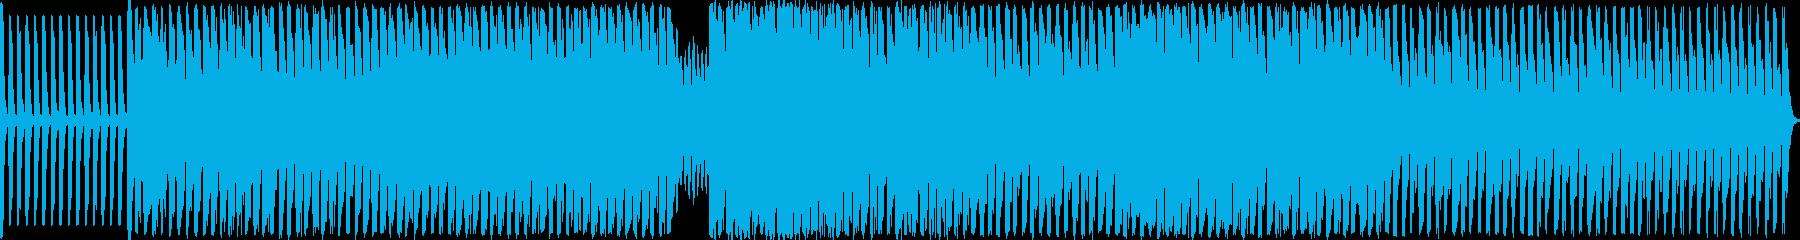 EDM。クレイジー。混乱。狂気。ビ...の再生済みの波形